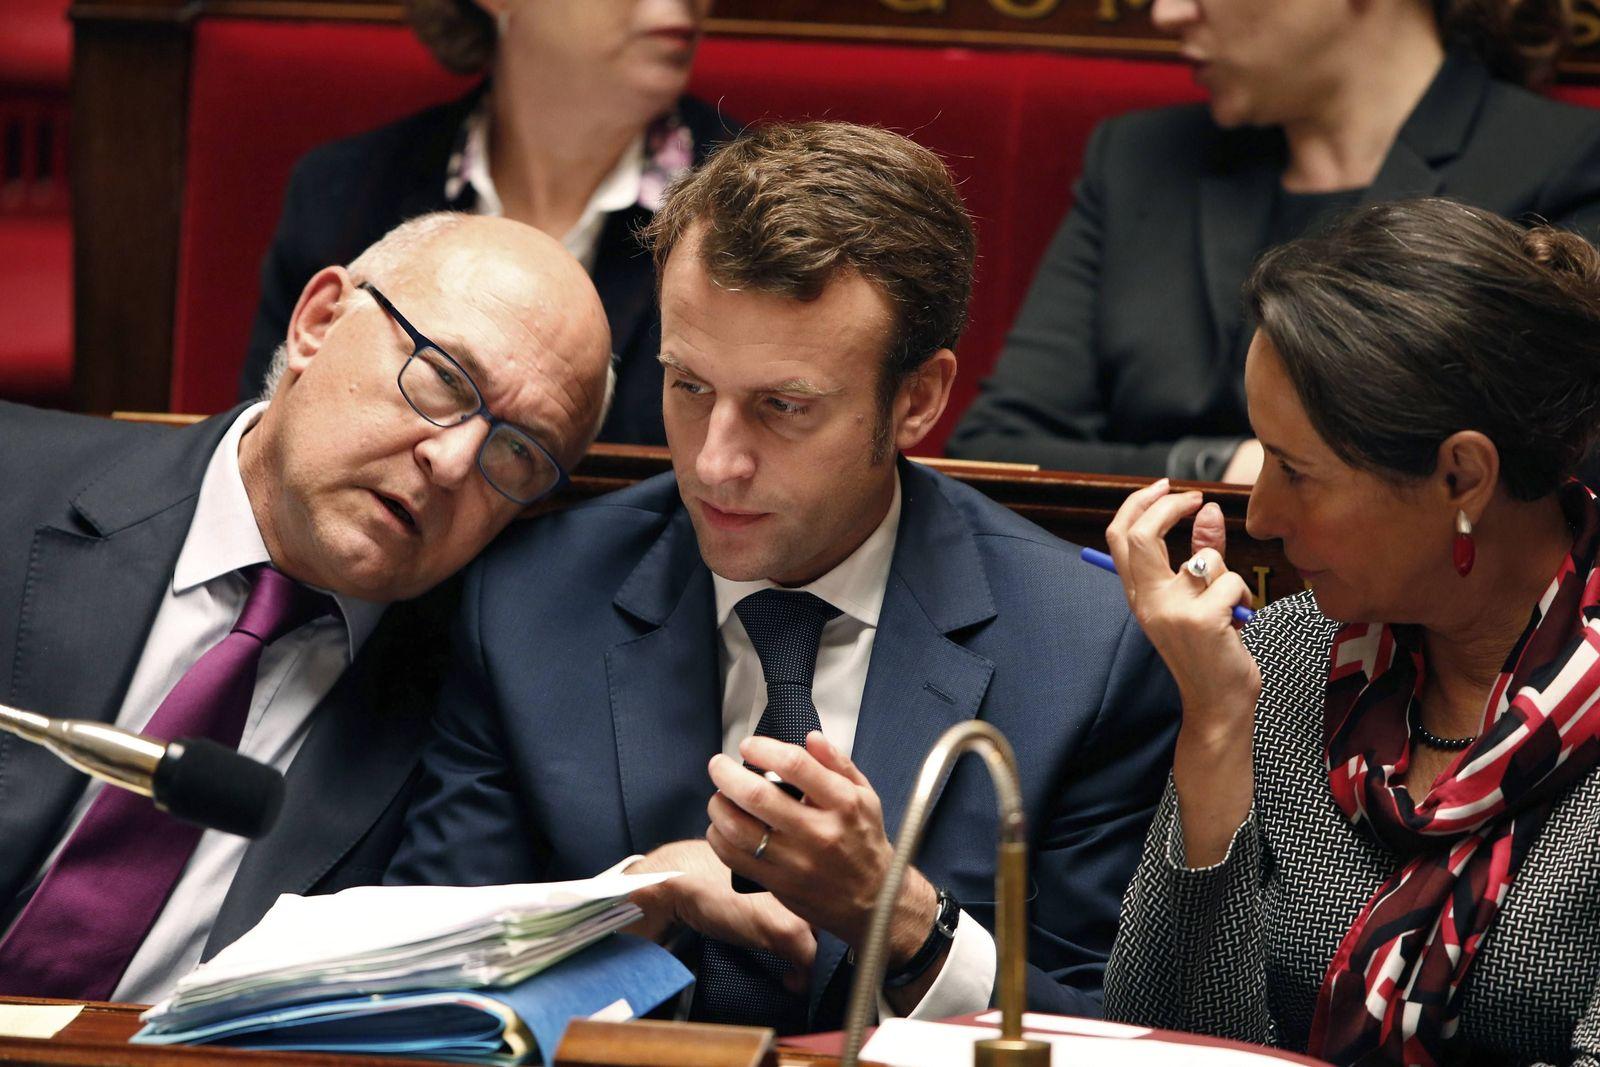 Macron / Sapin